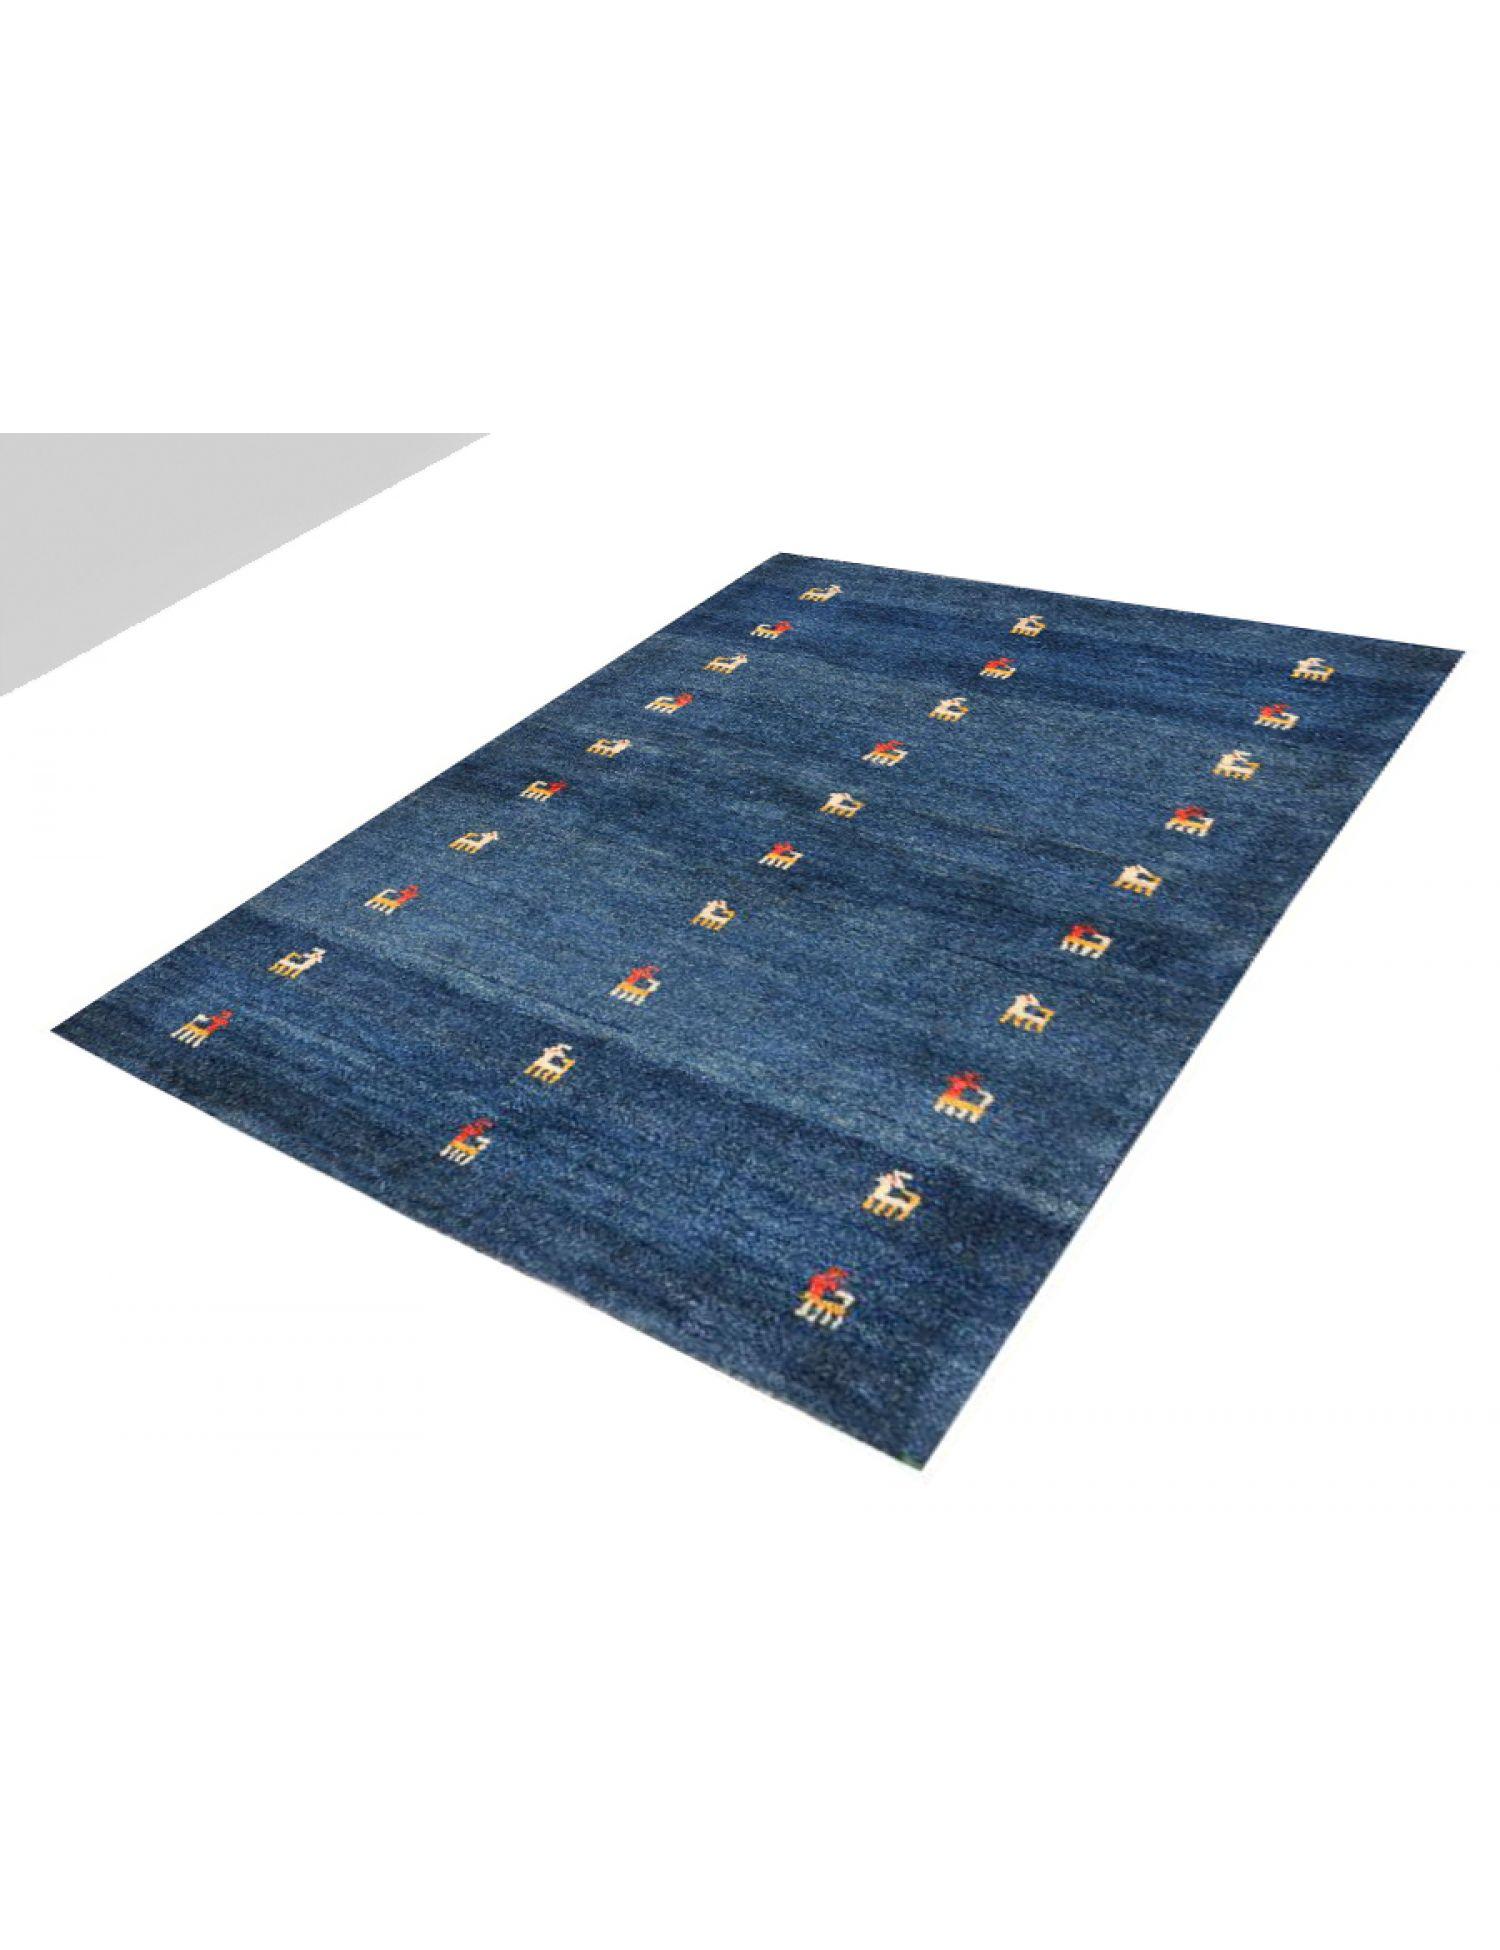 Alfombras modernas  azul <br/>113 x 89 cm